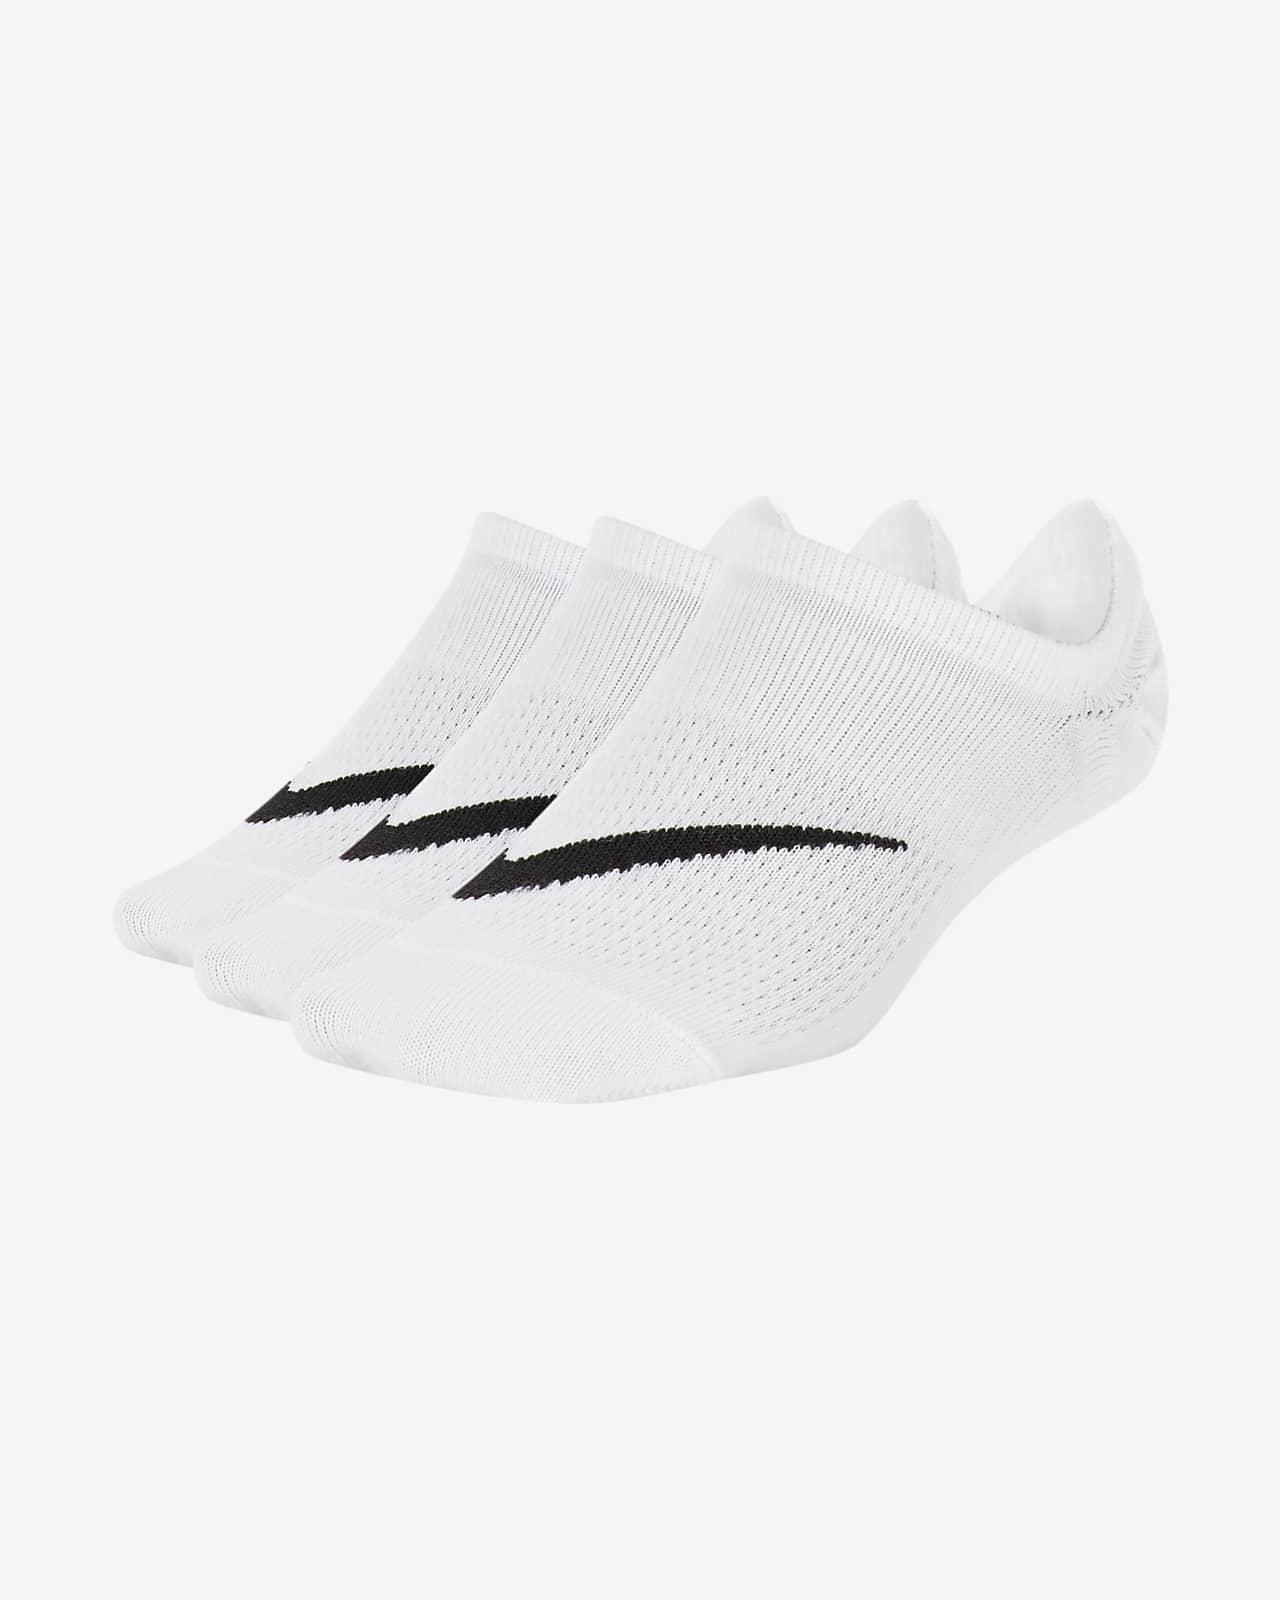 Salvapiedi leggeri Nike Everyday (3 paia) - Bambini